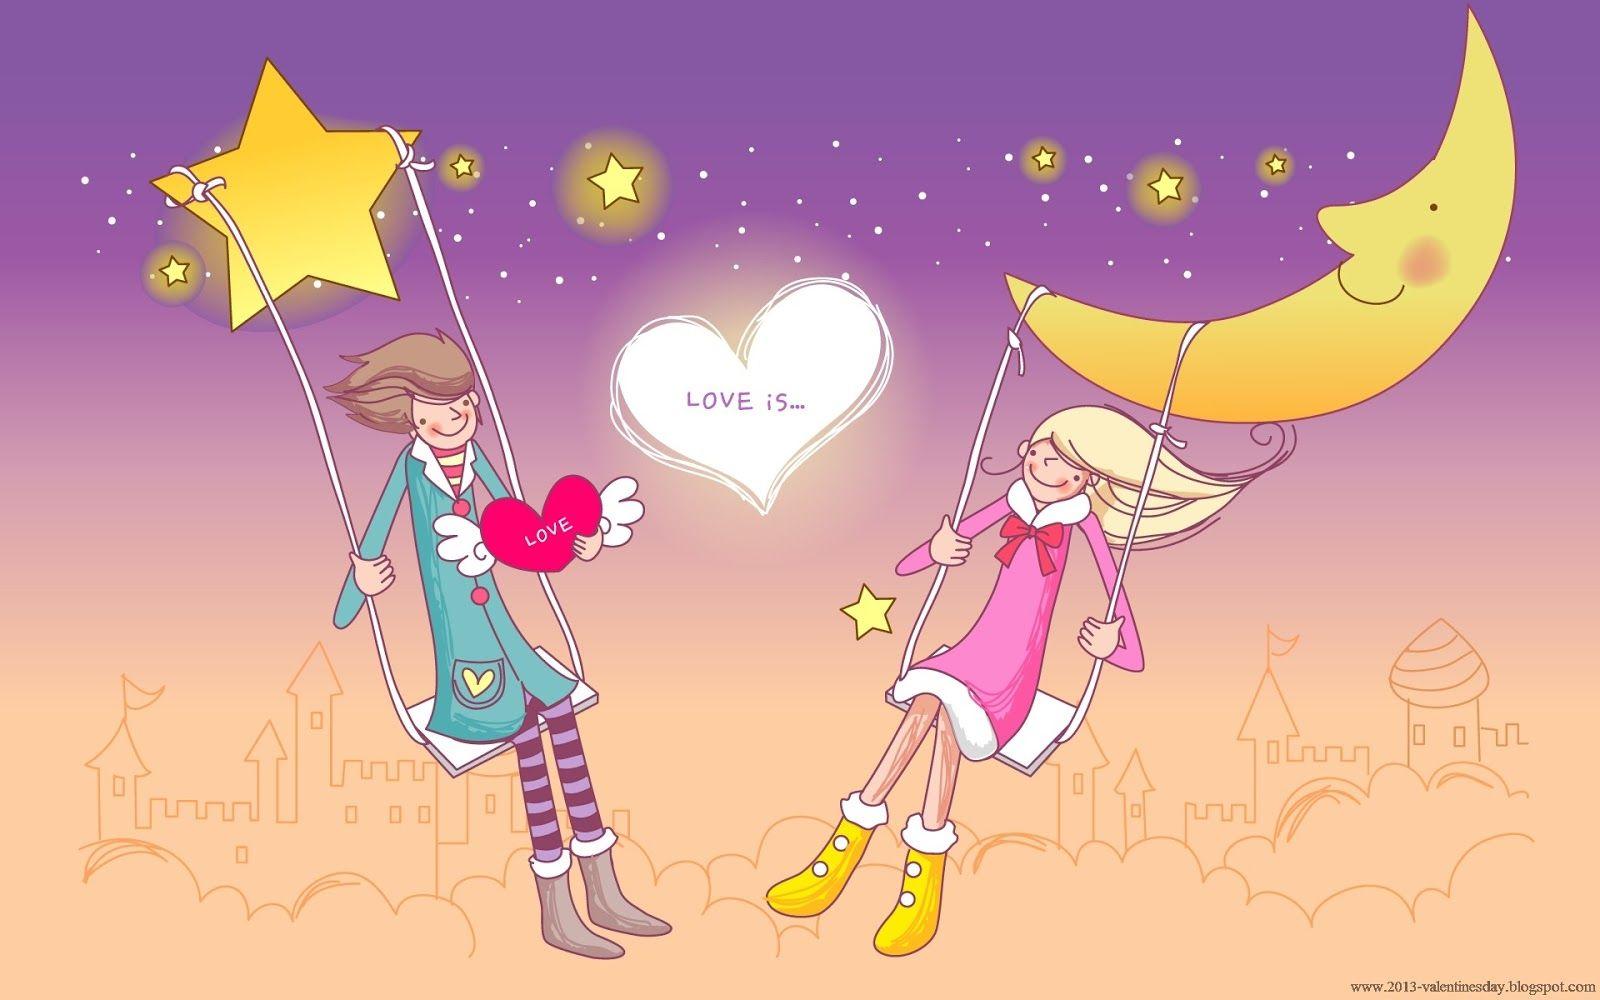 Download Wallpaper I Love You Cartoon - 157390be6f9f7be5a4c4fda2c9555754  You Should Have_58713   .jpg